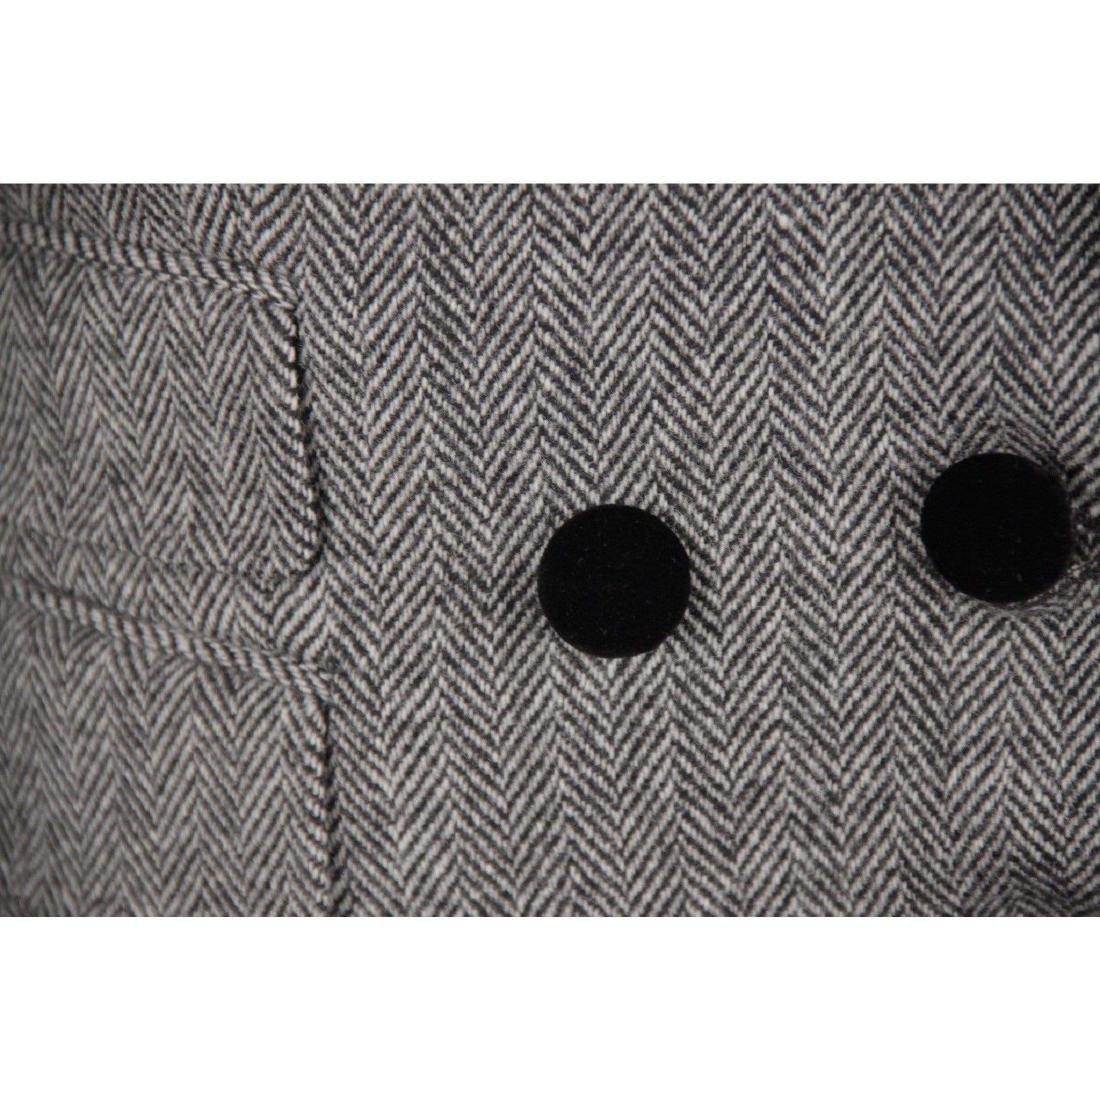 DOLCE & GABBANA Herringbone Wool Blend SUIT Blazer & - 4